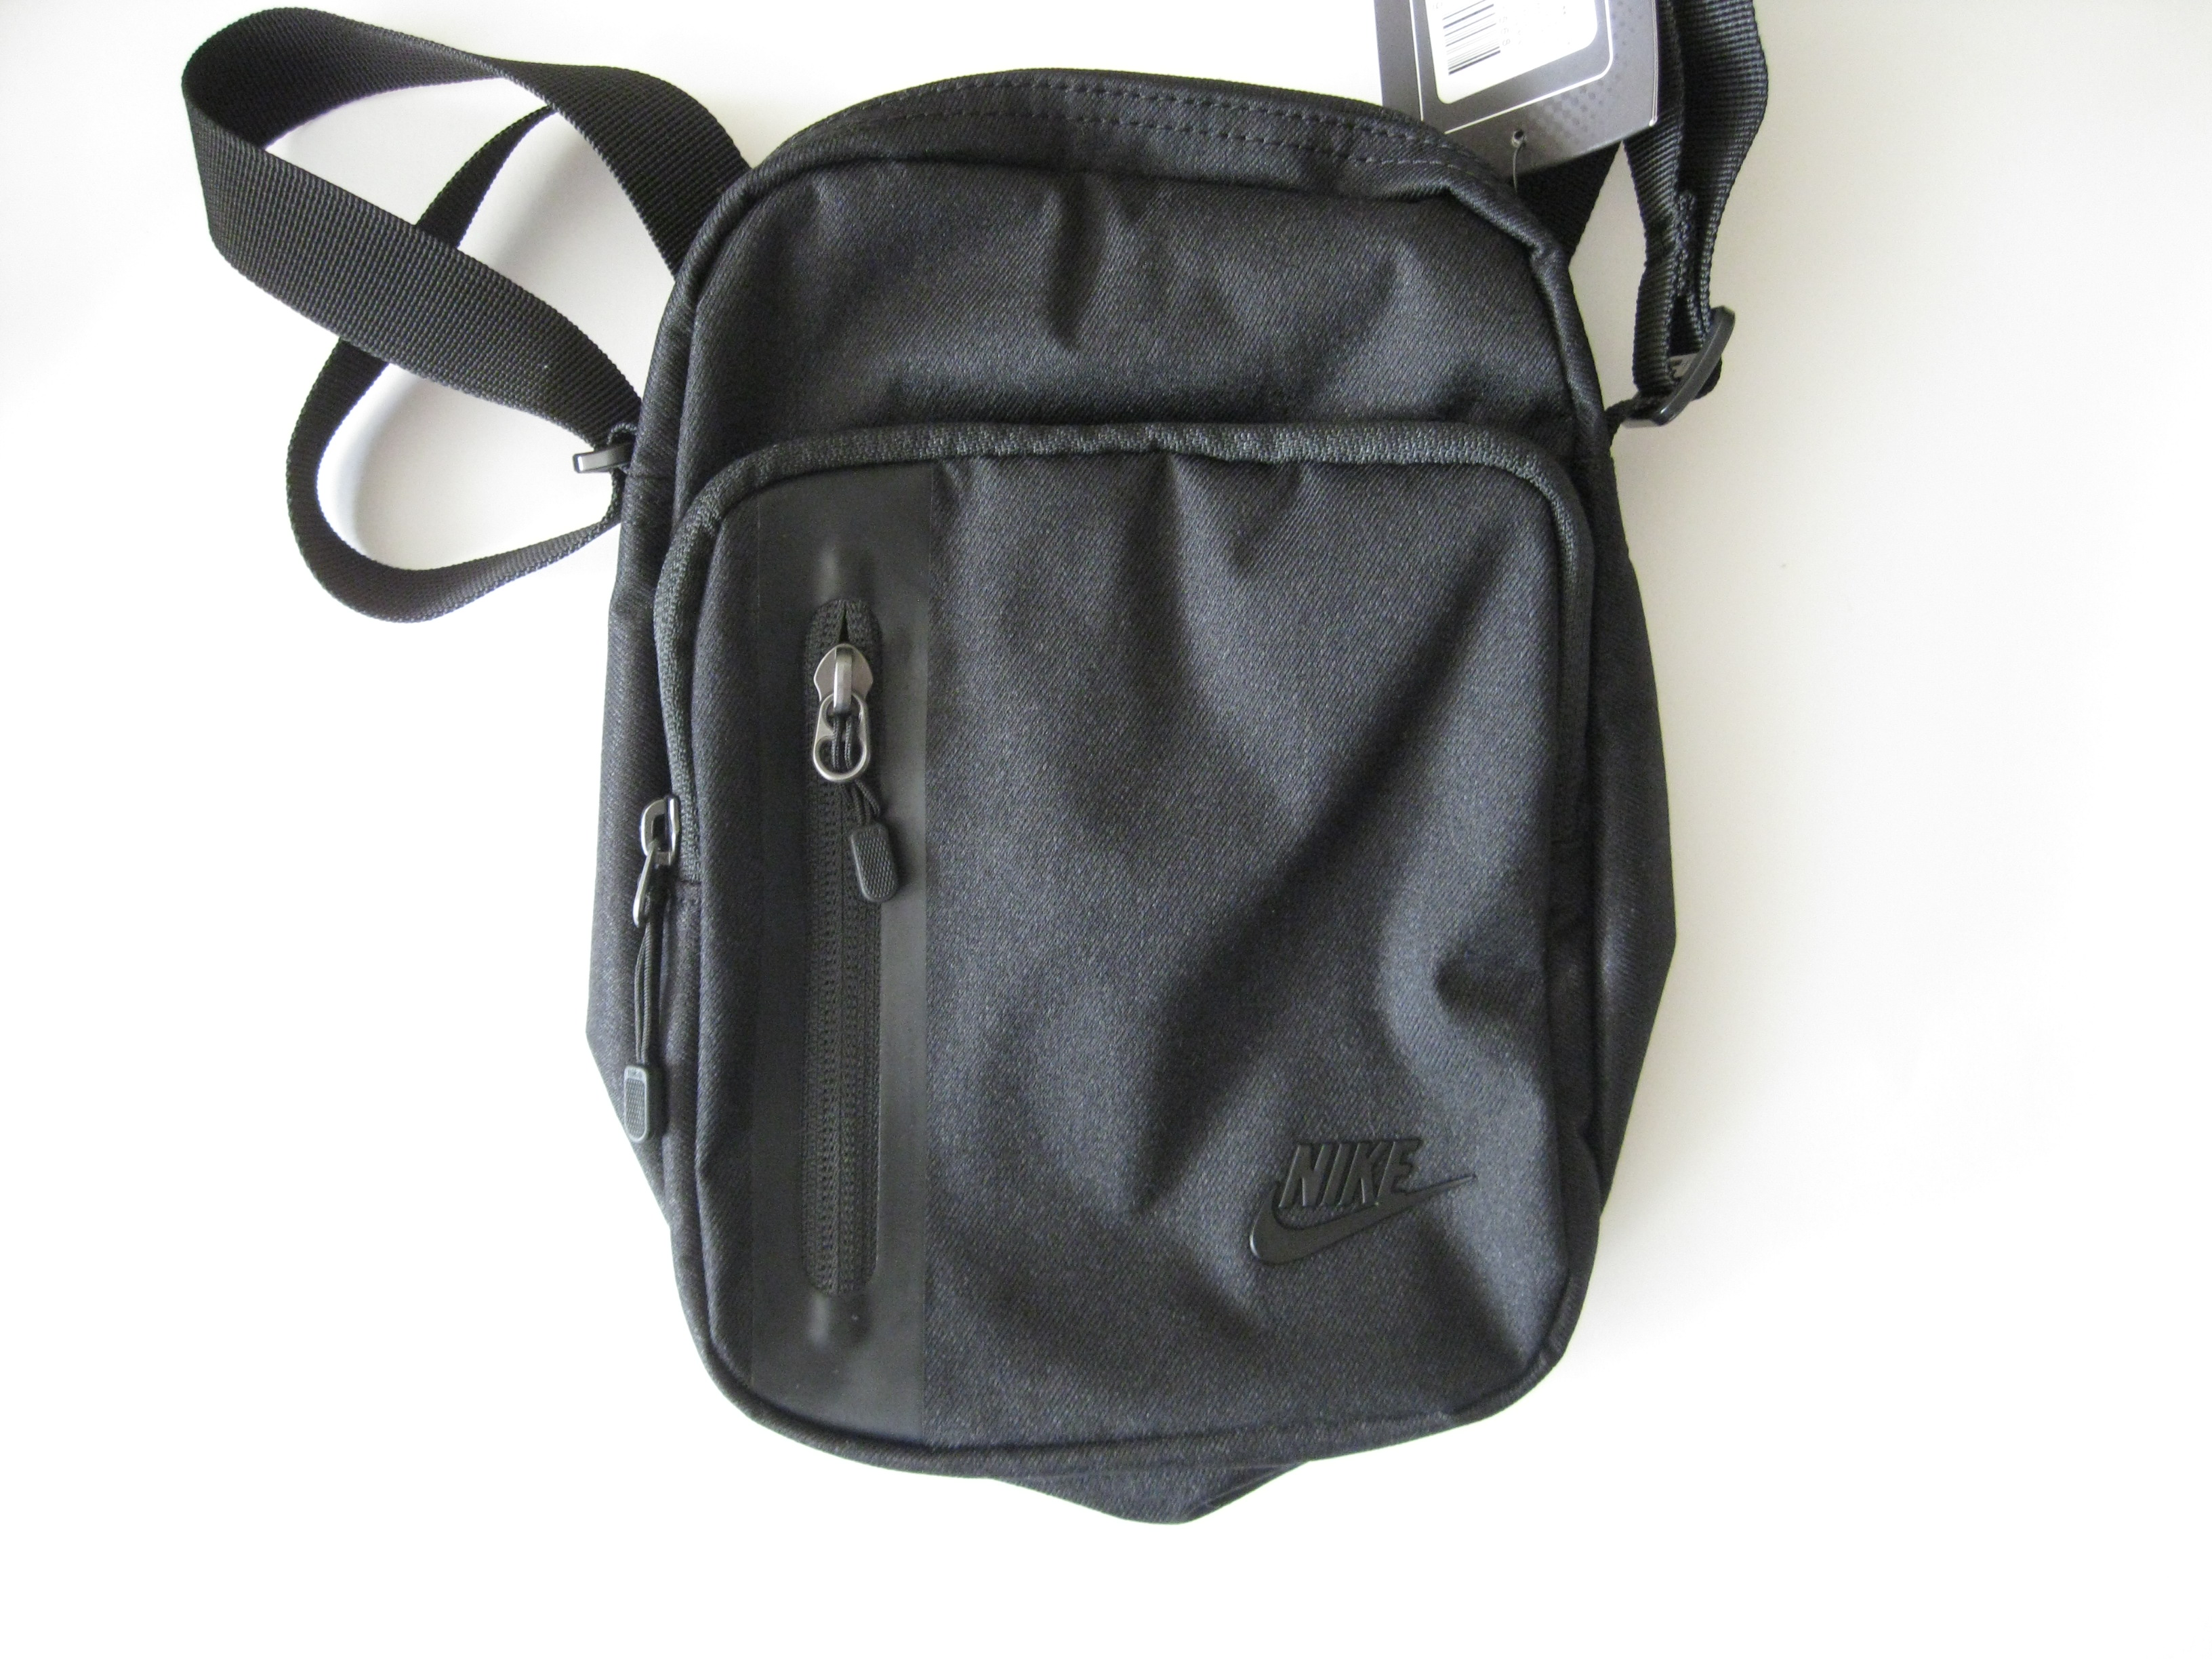 f4289f12927 Nike Core Small Items 3.0 Messenger Black   Grailed